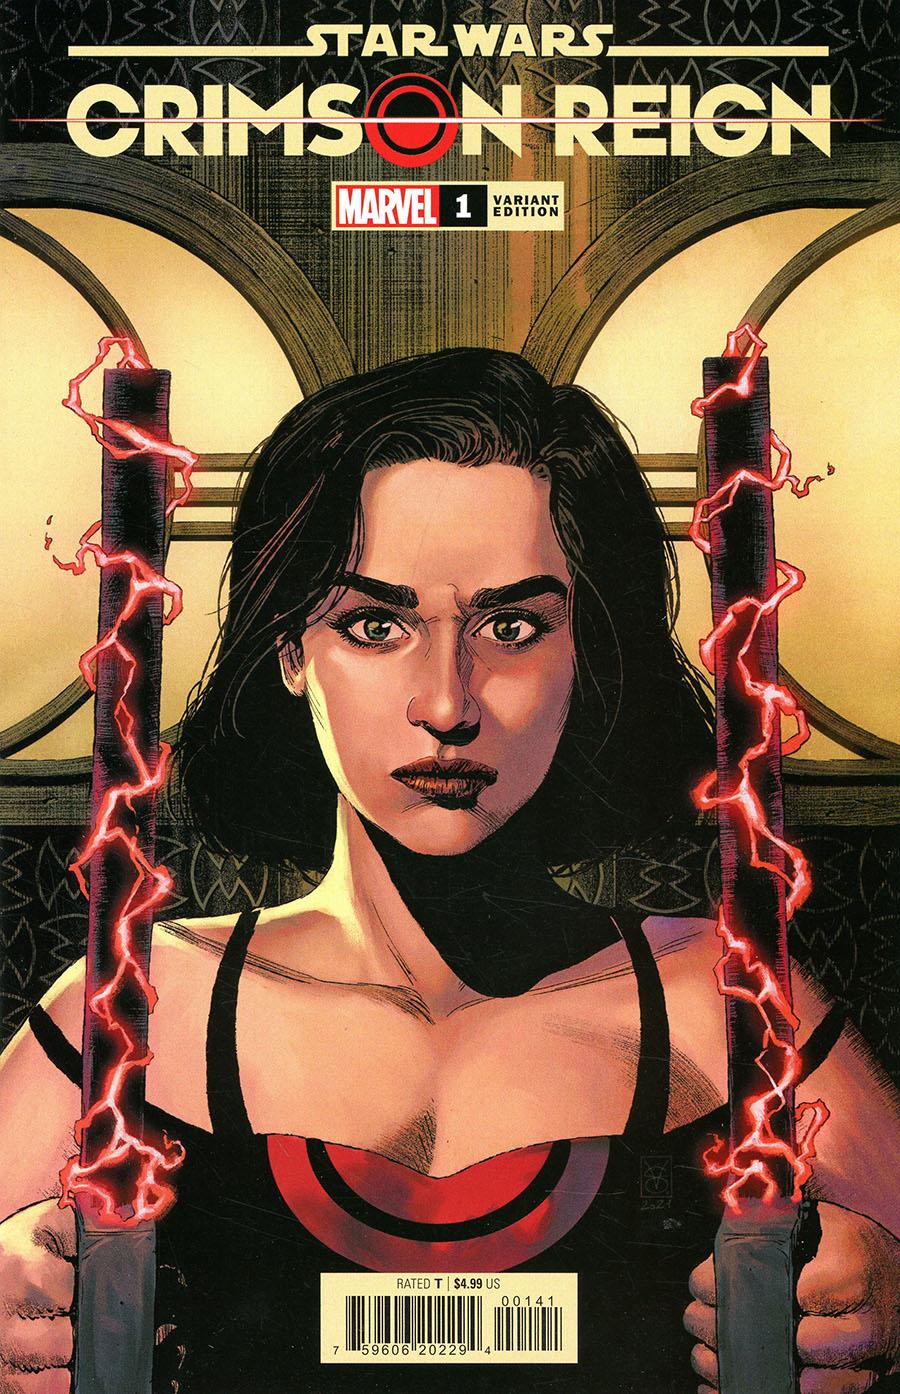 "Crimson Reign #1 (Valerio Giangiordano ""Warriors of Dawn"" Variant Cover) (01.12.2021)"